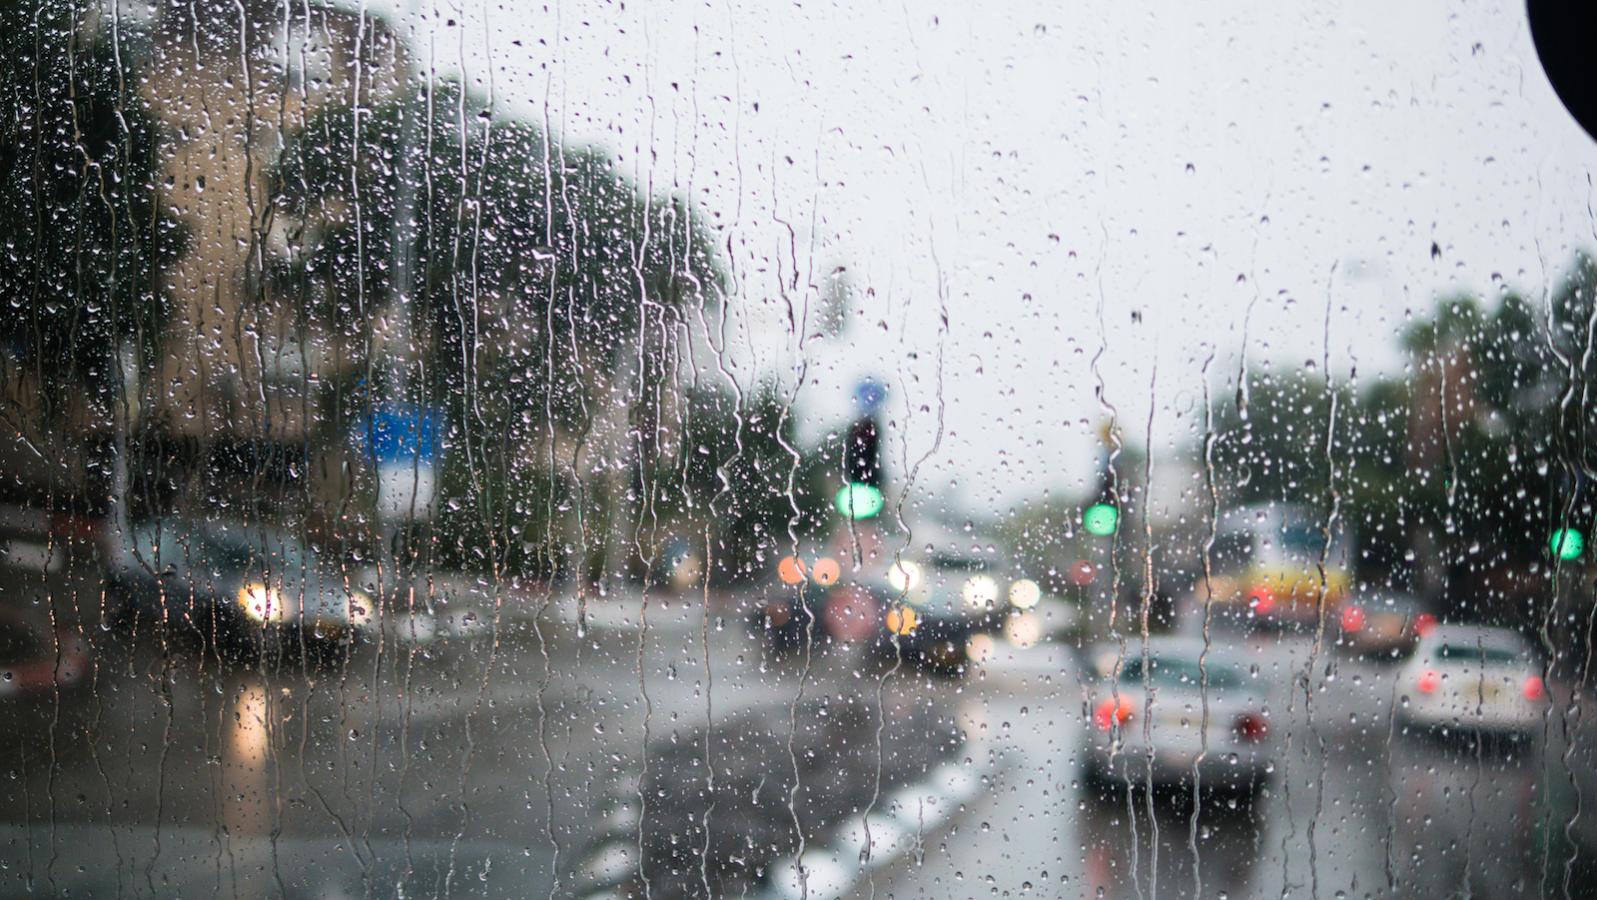 rain-israel-1597x900.jpg